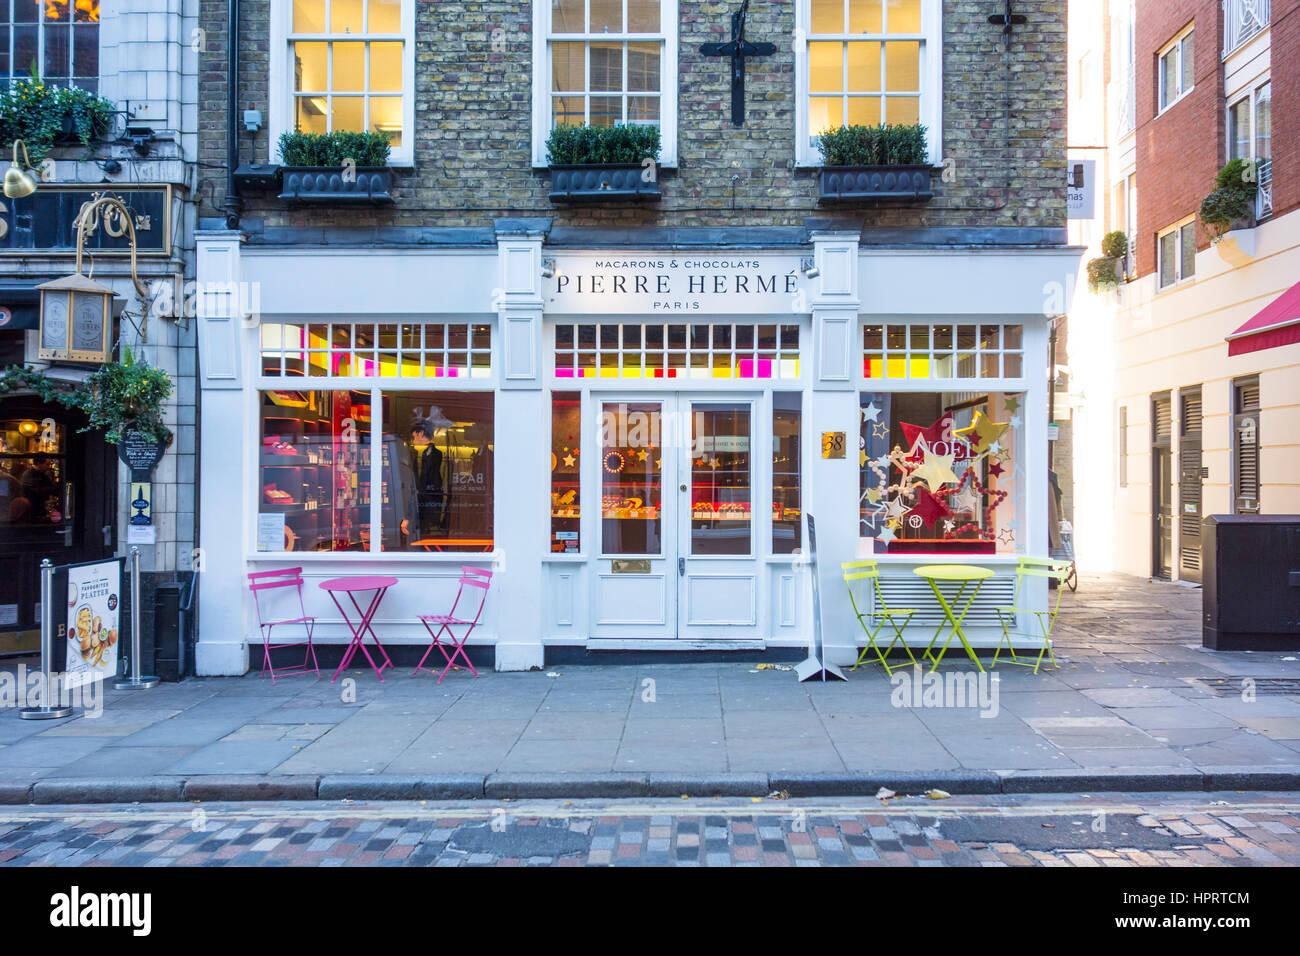 Pierre Herme patisserie shop, Monmouth Street, Seven Dials, Covent Garden, London, UK - Stock Image